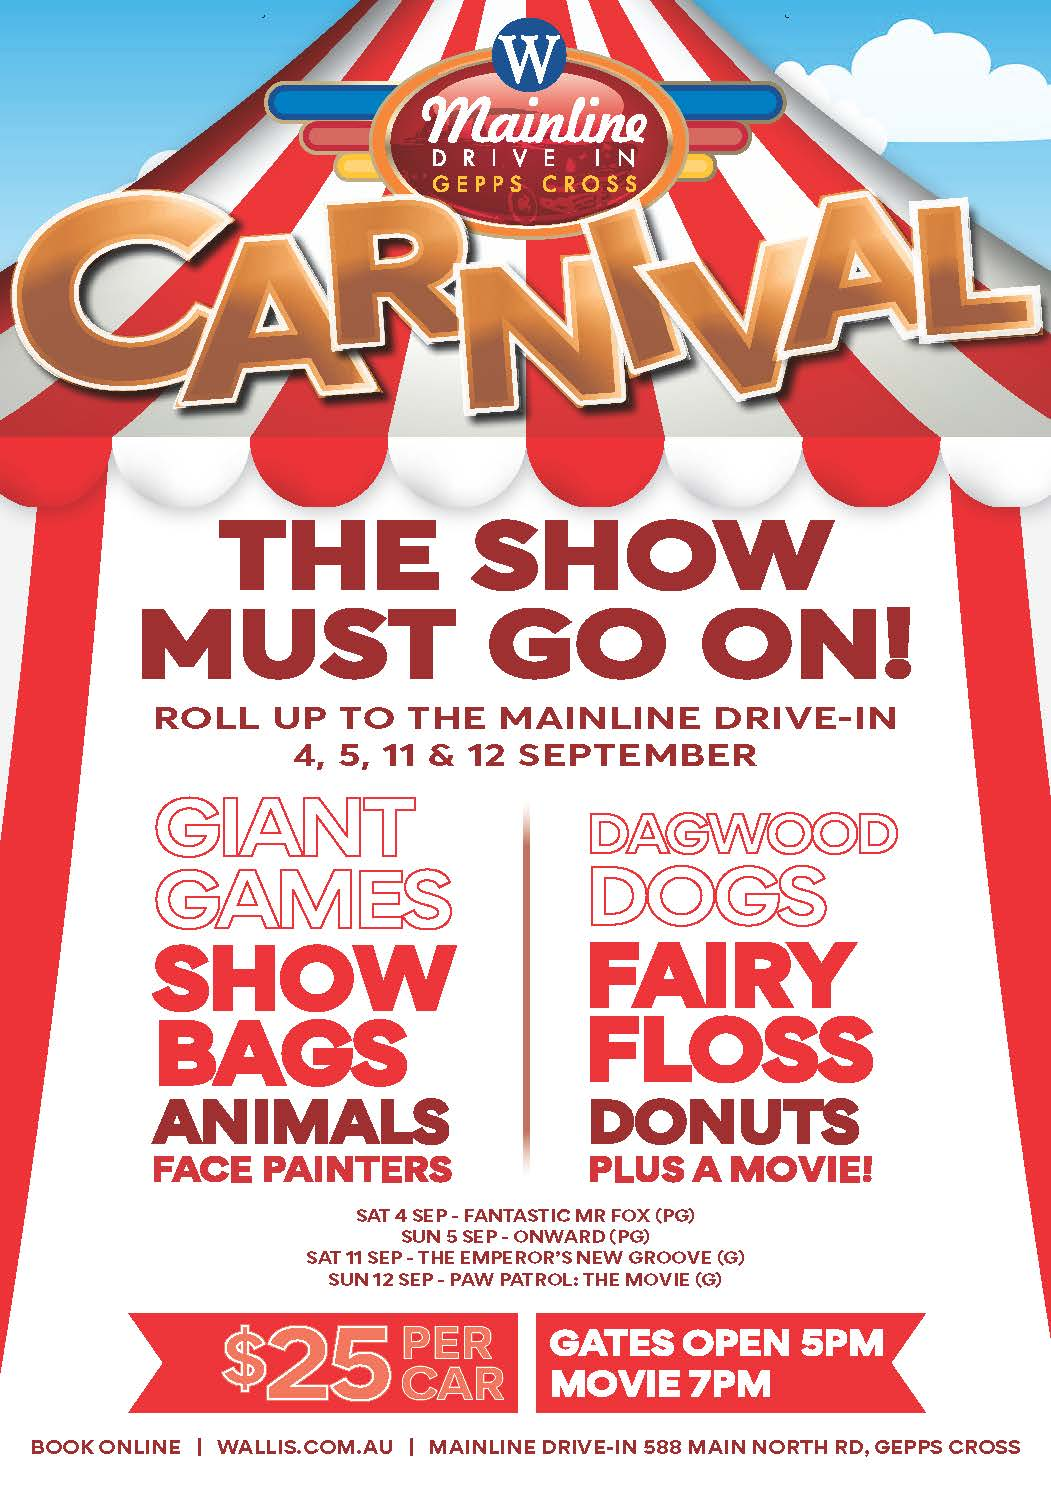 Wallis Cinema's Mainline Drive-in Carnival?>